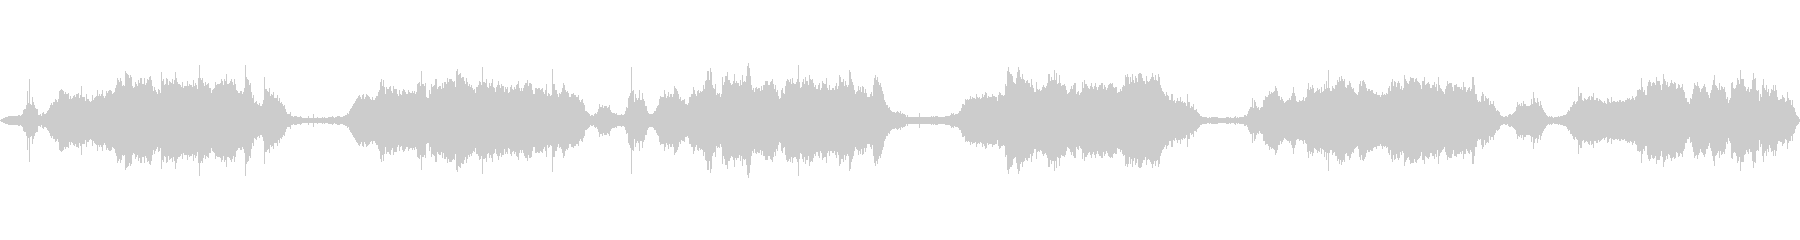 【ASMR】〜雨の日〜道路収録_0001の未再生の波形